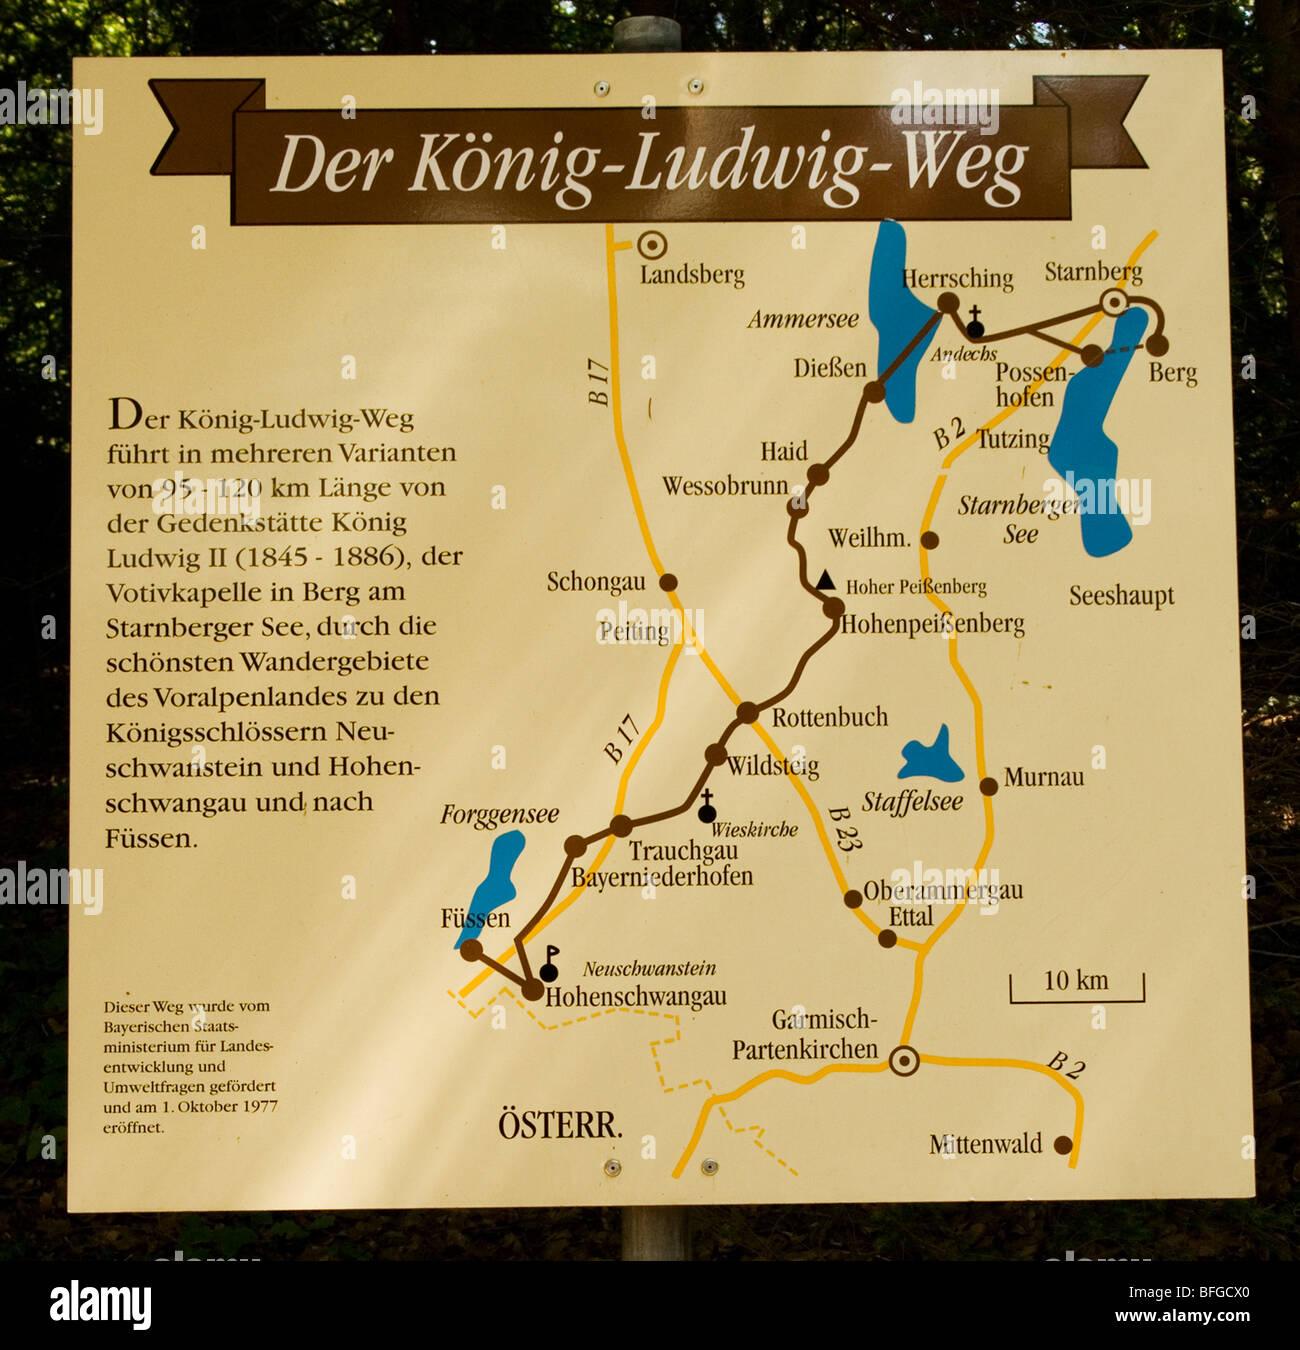 Bavaria Germany Along The King Ludwig Way Or Koenig Ludwig The